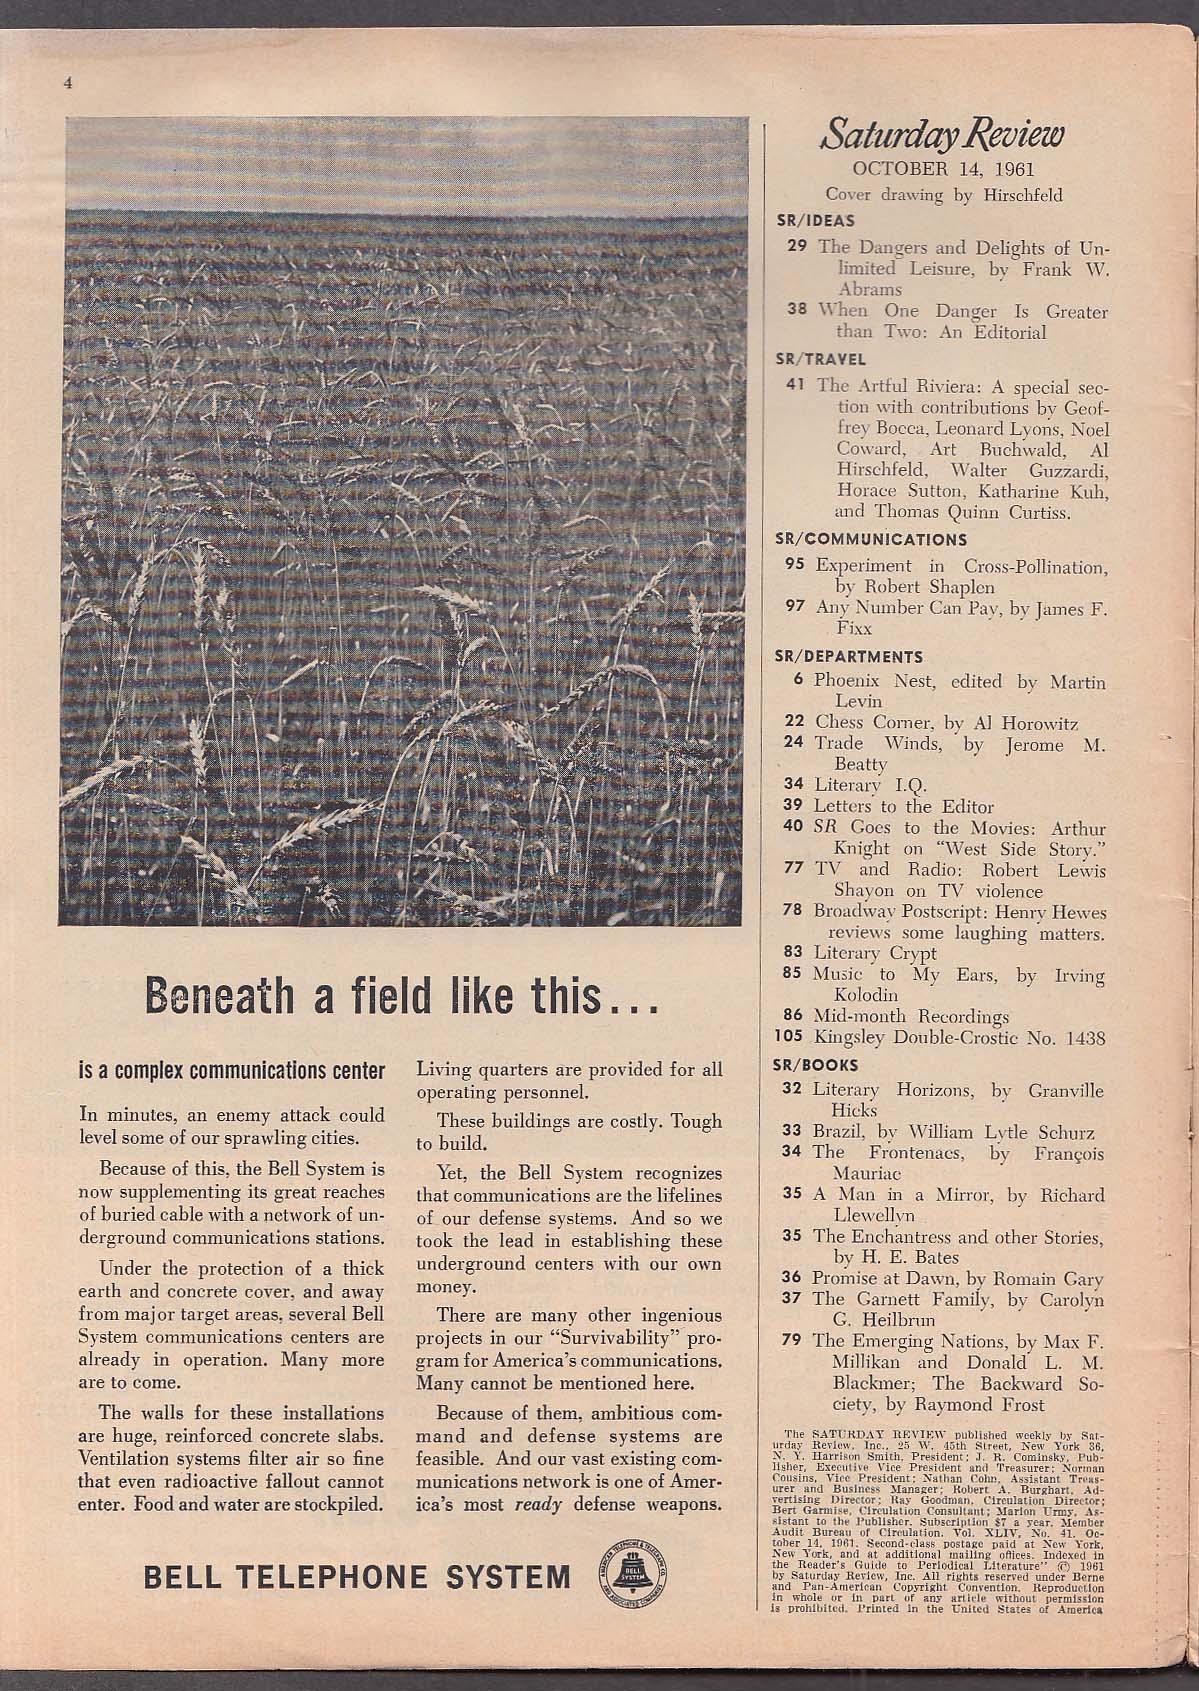 Image for SATURDAY REVIEW Picasso Hirschfeld Riviera Noel Coward Art Buchwald + 10/14 1961